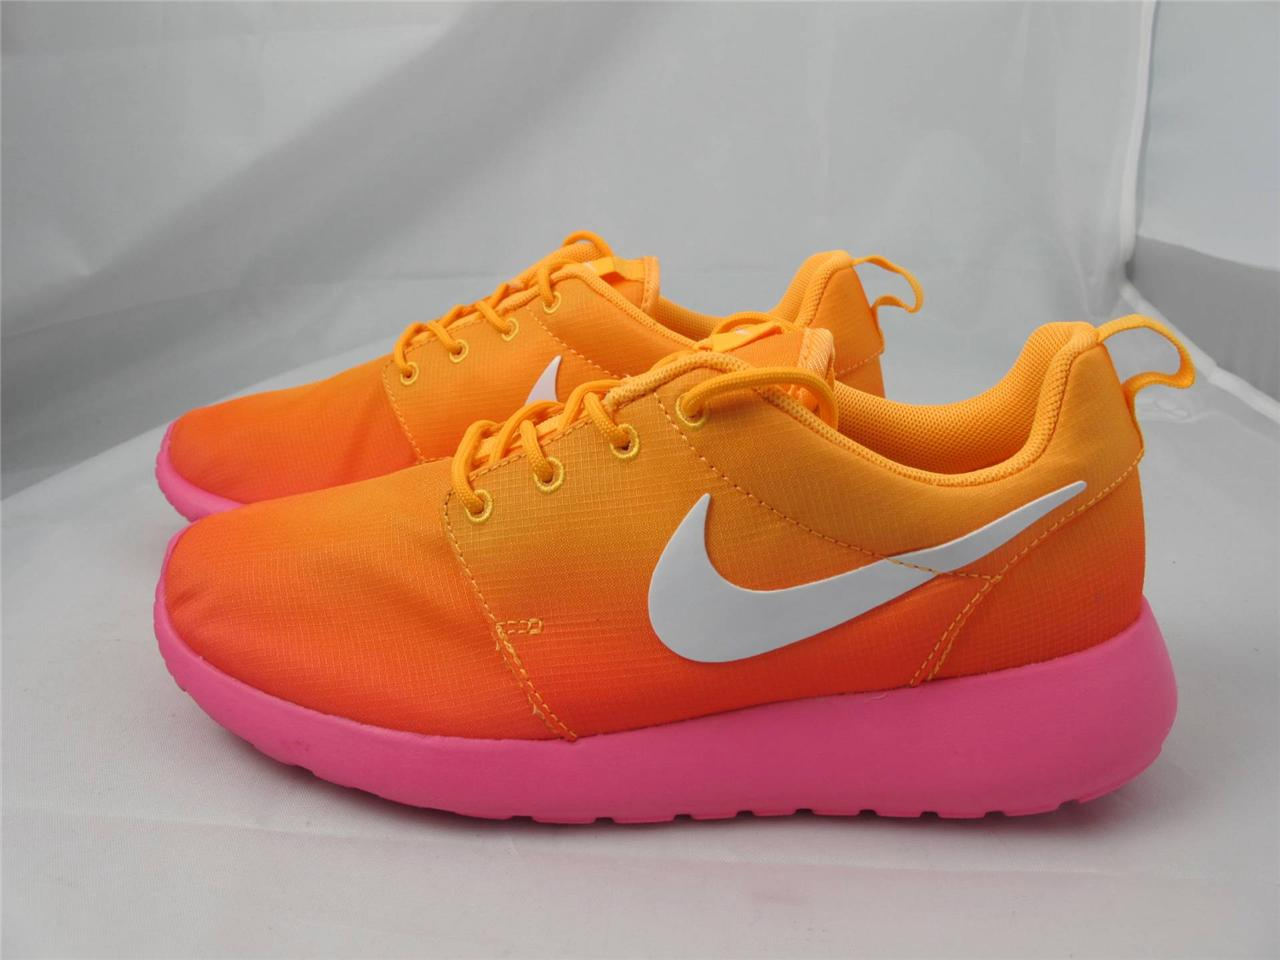 roshes orange and pink